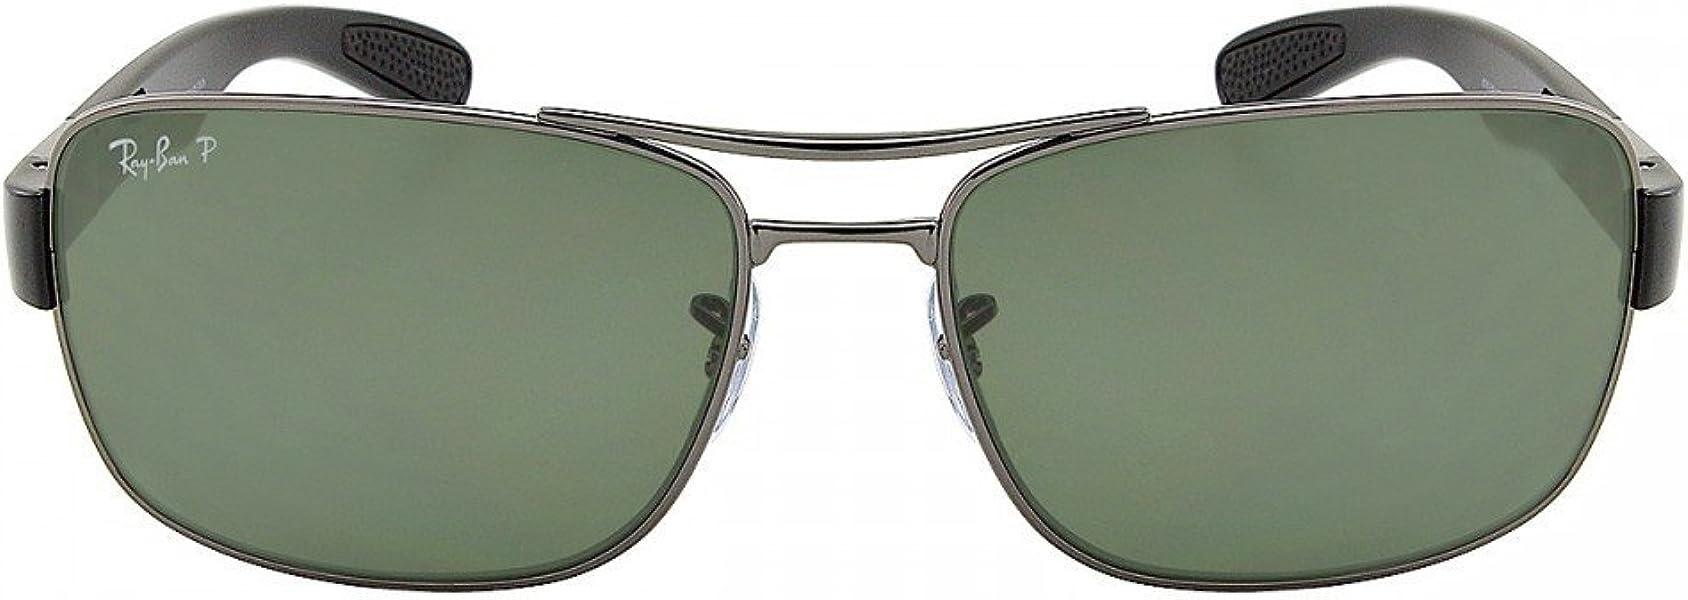 0b5a0e88d5c Ray Ban RB3522 004 9A 64mm Gunmetal Polarized Green Sunglasses ...